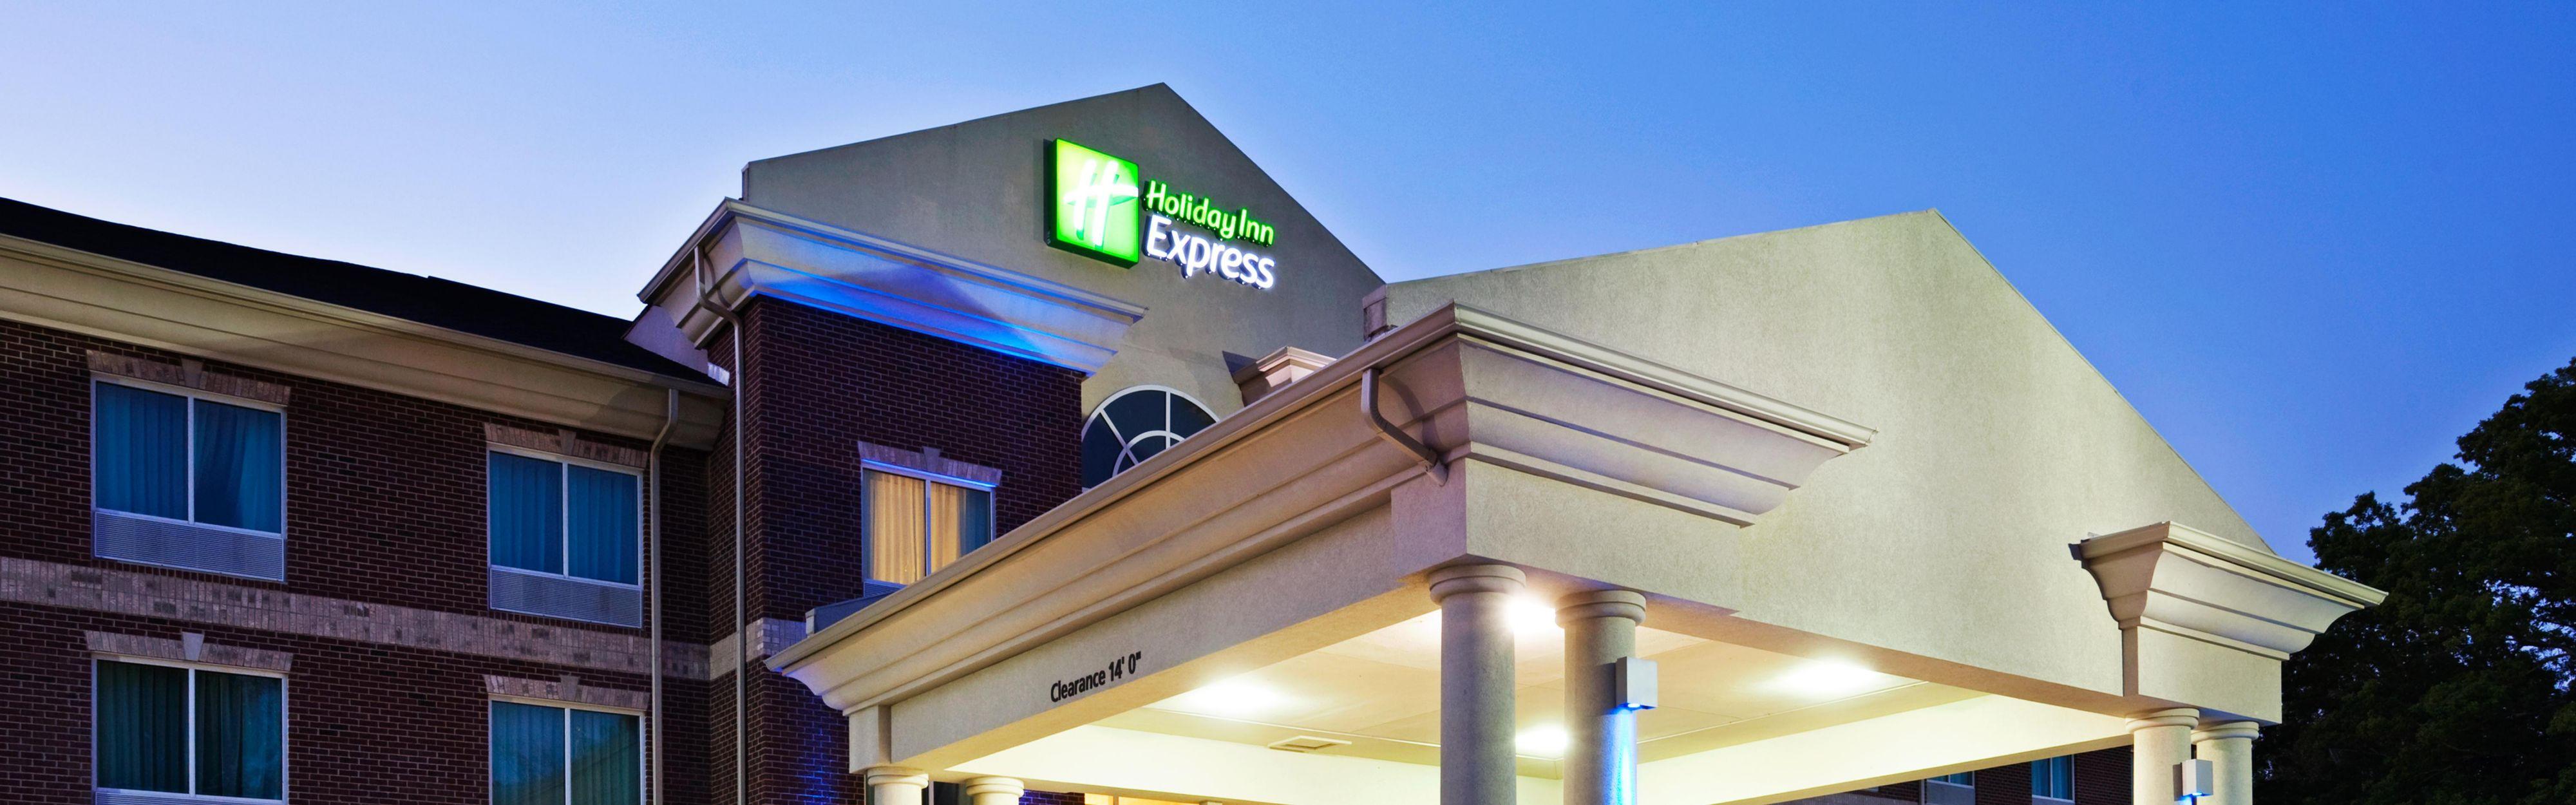 Holiday Inn Express Carrollton image 0